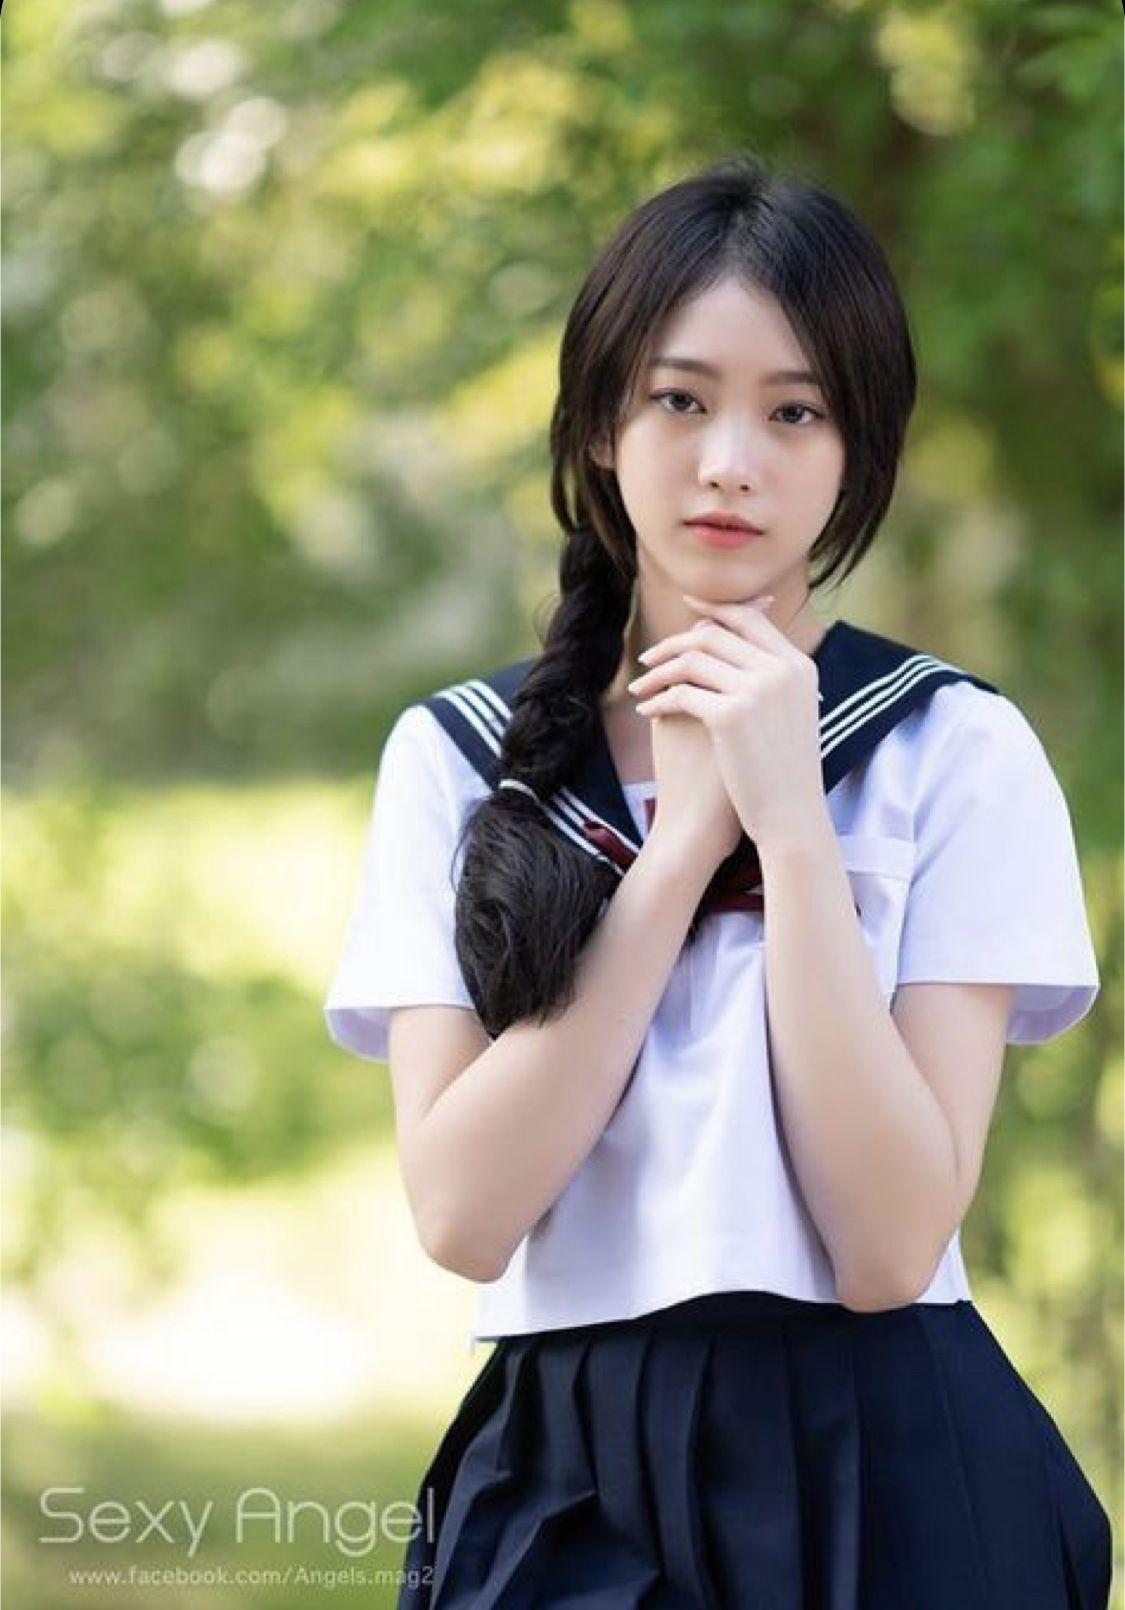 Chinese Model Sabrina Hot Sideboobs and School Girl